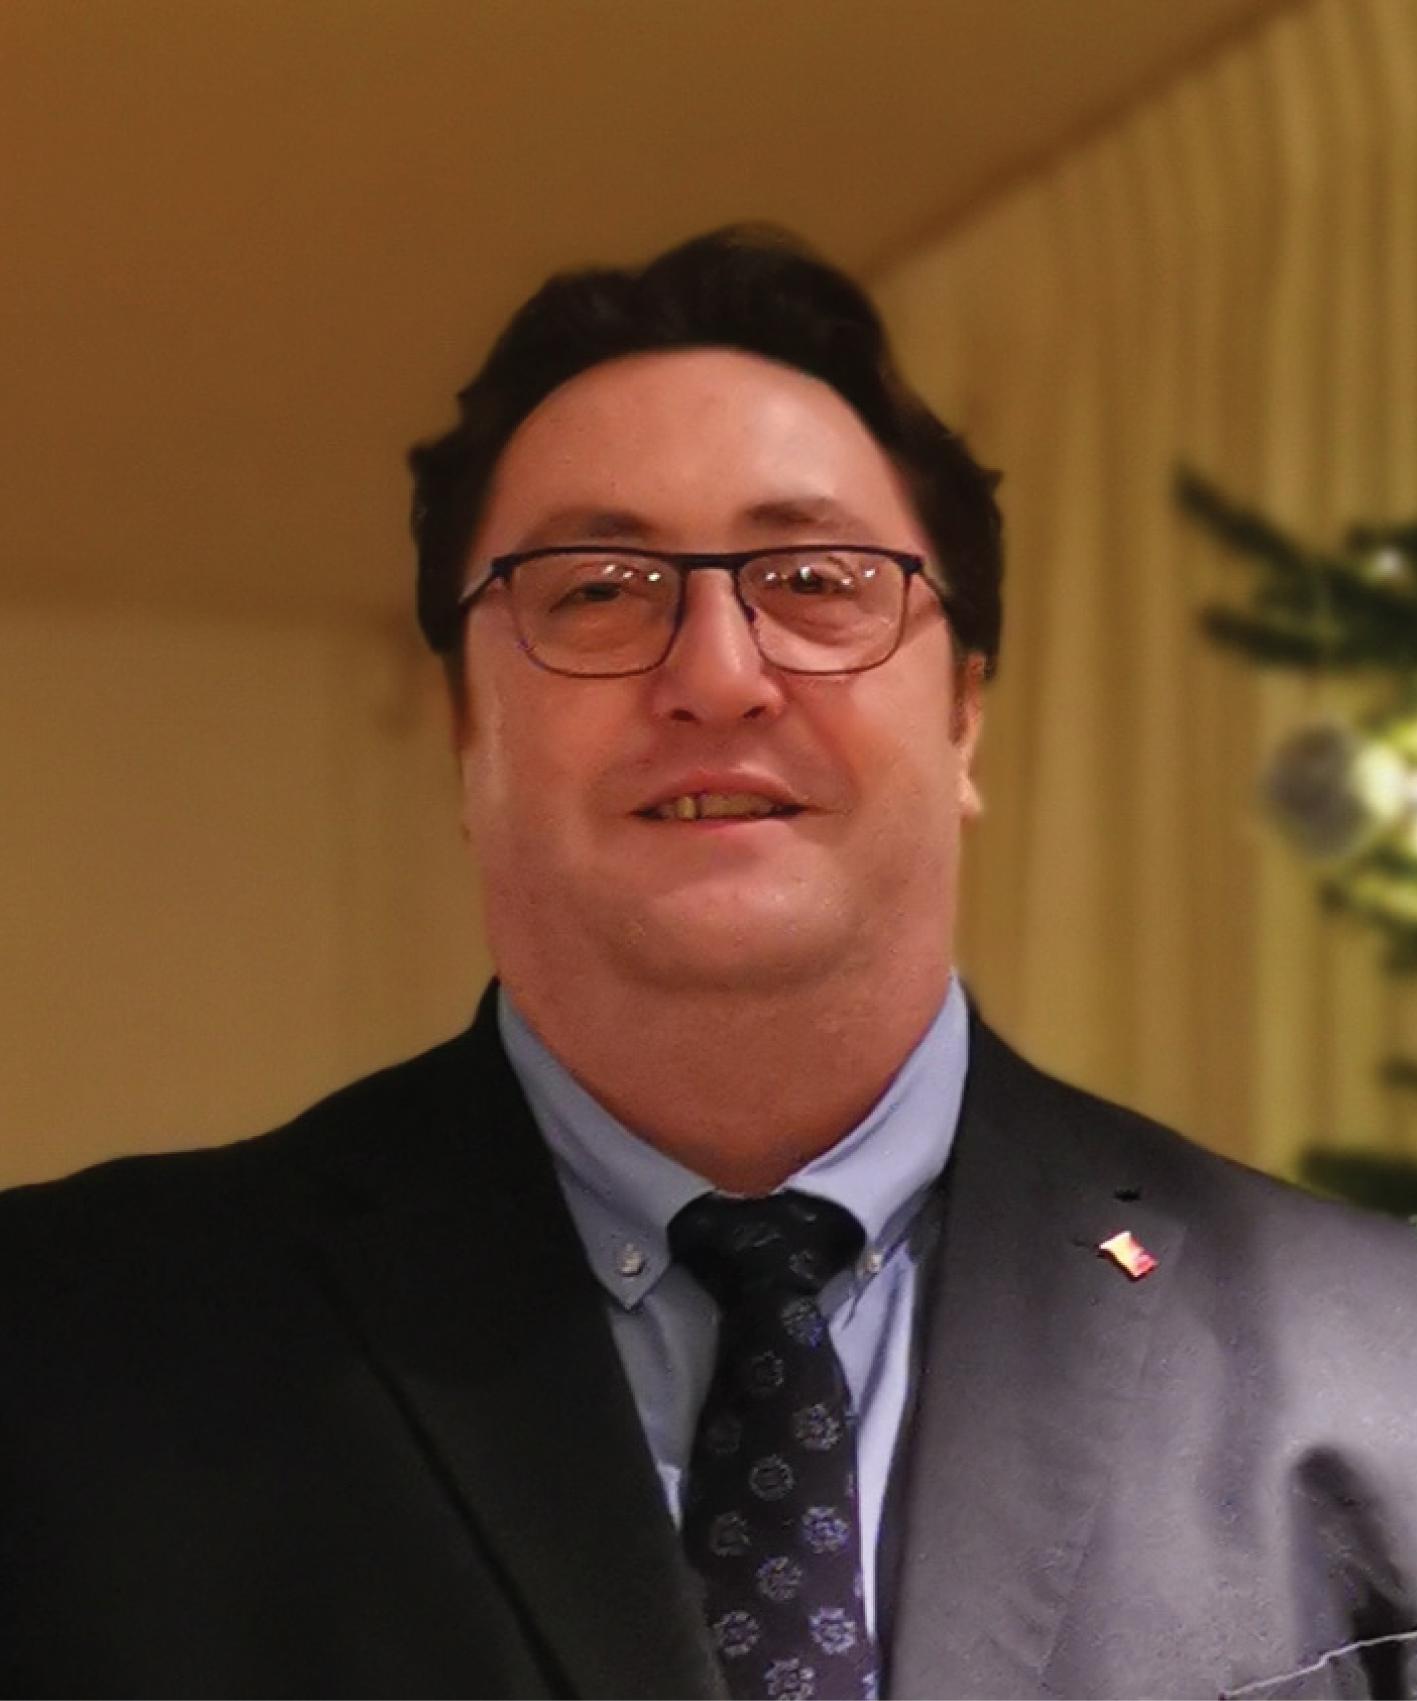 Vito Palmeri